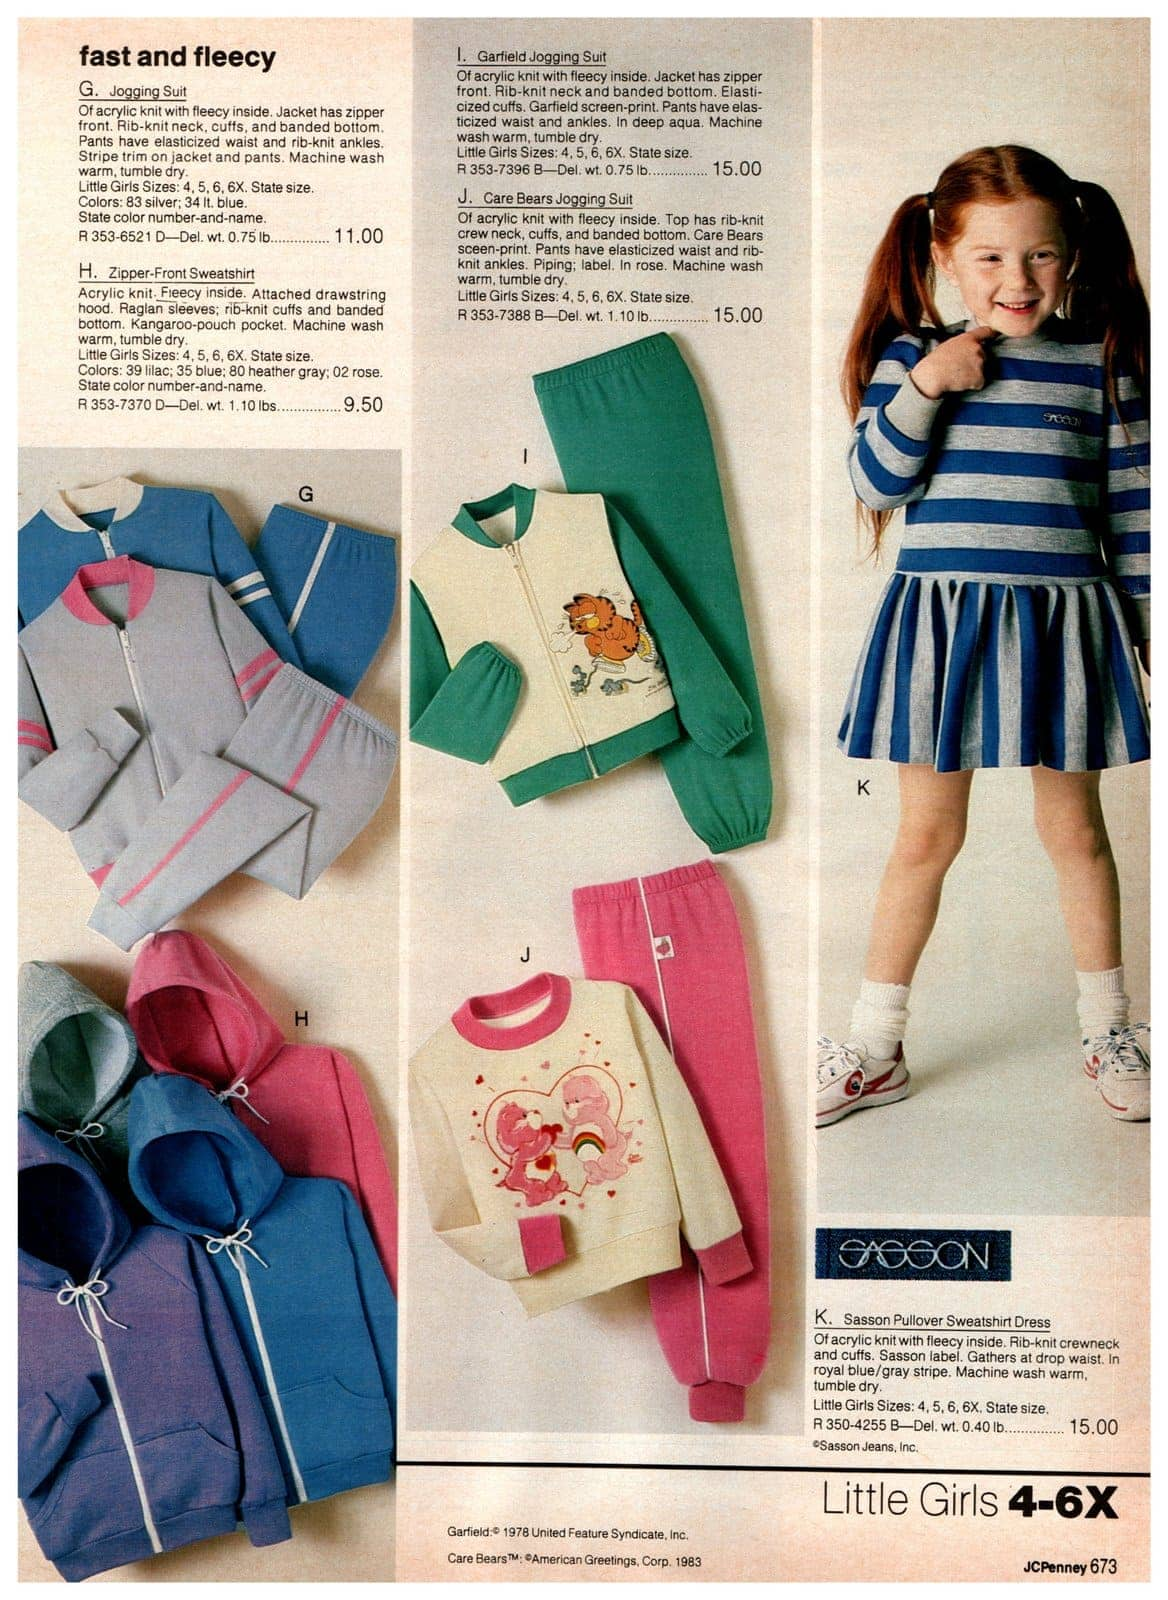 Fleecy winter clothing for little girls